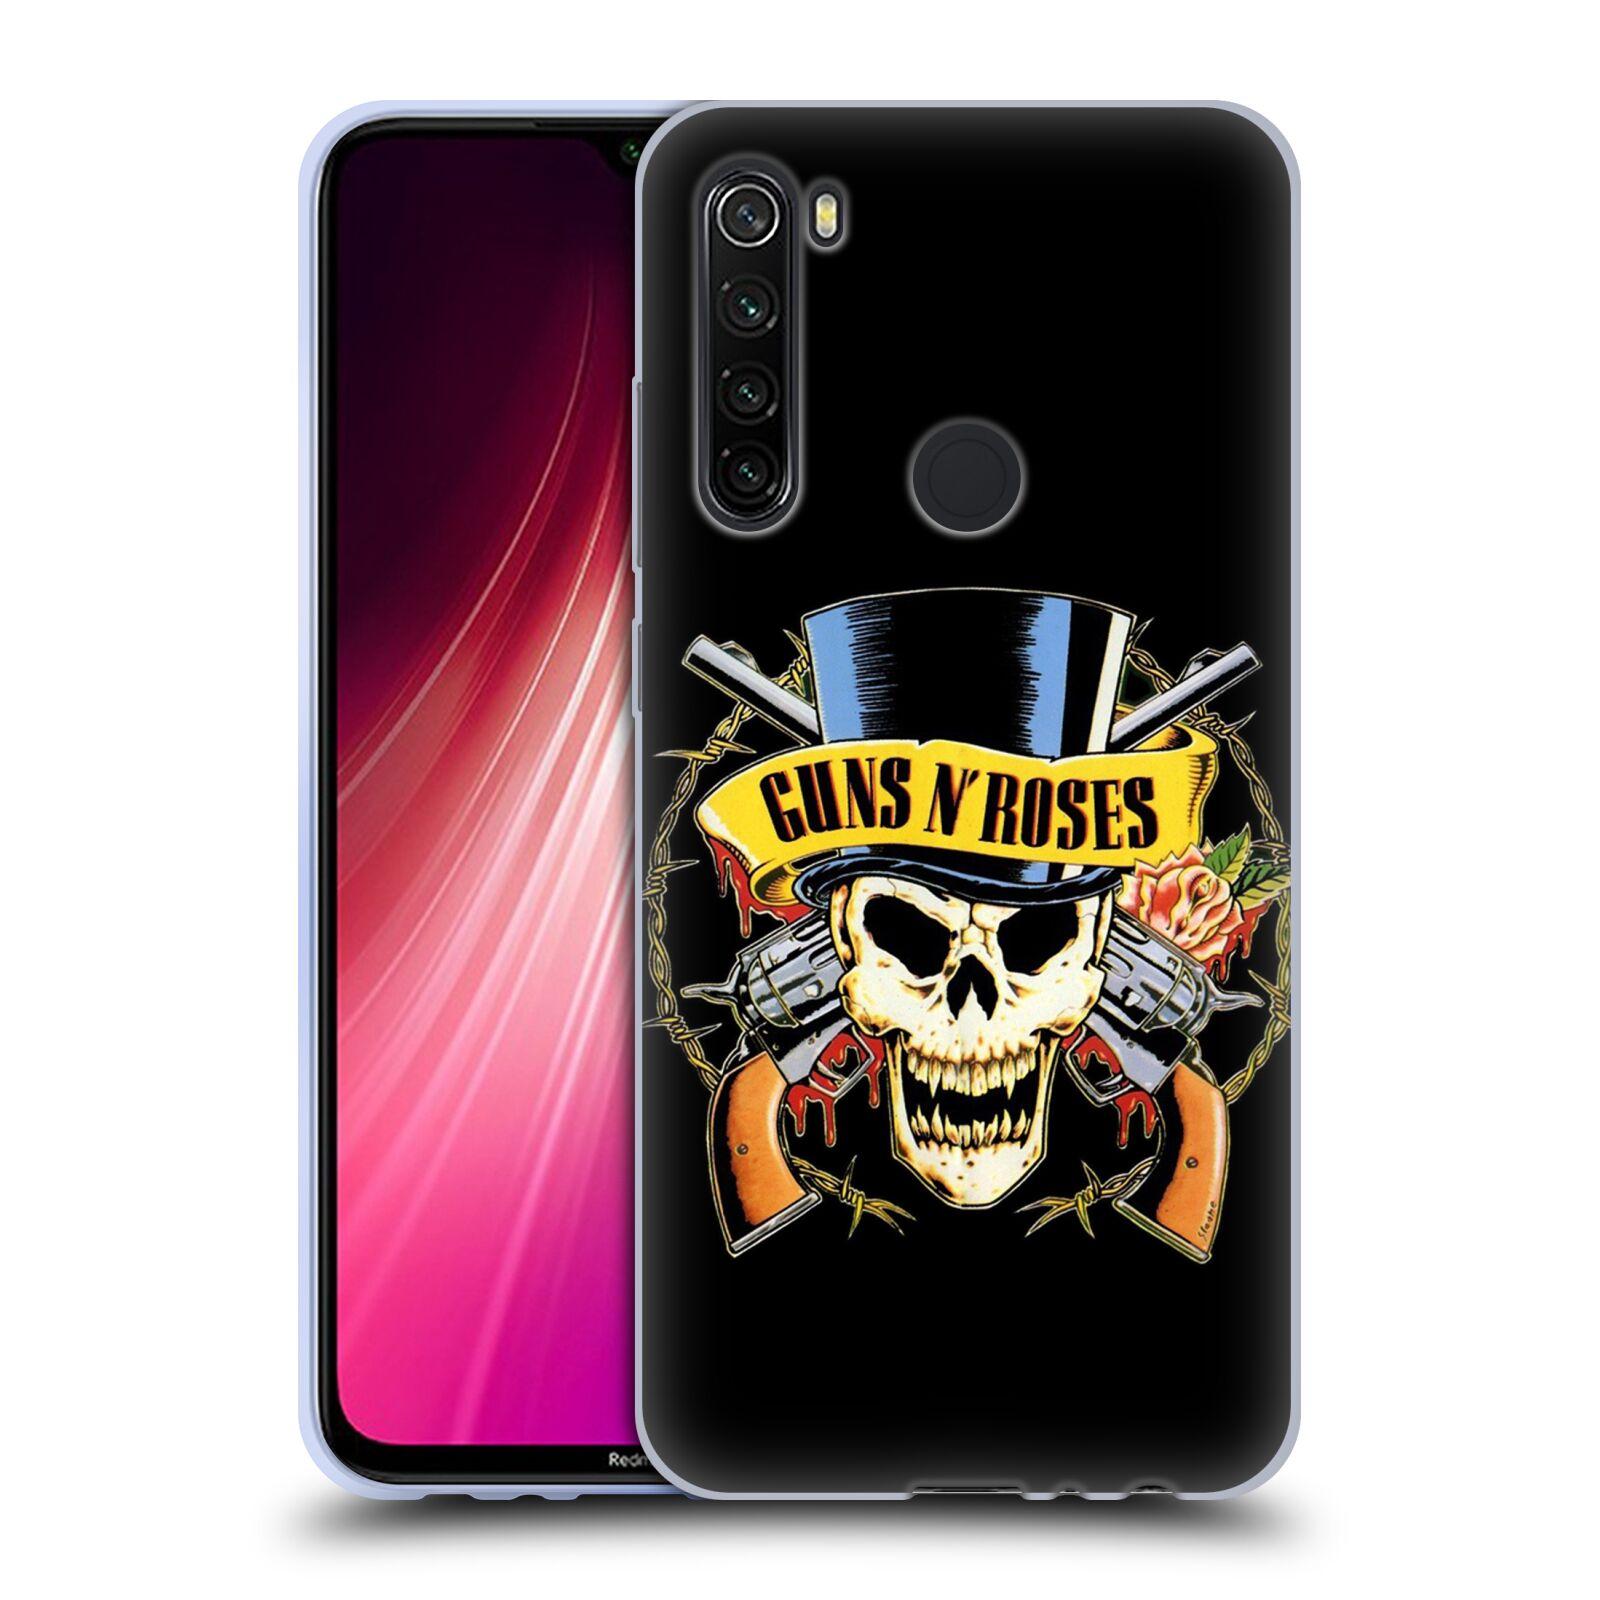 Silikonové pouzdro na mobil Xiaomi Redmi Note 8T - Head Case - Guns N' Roses - Lebka